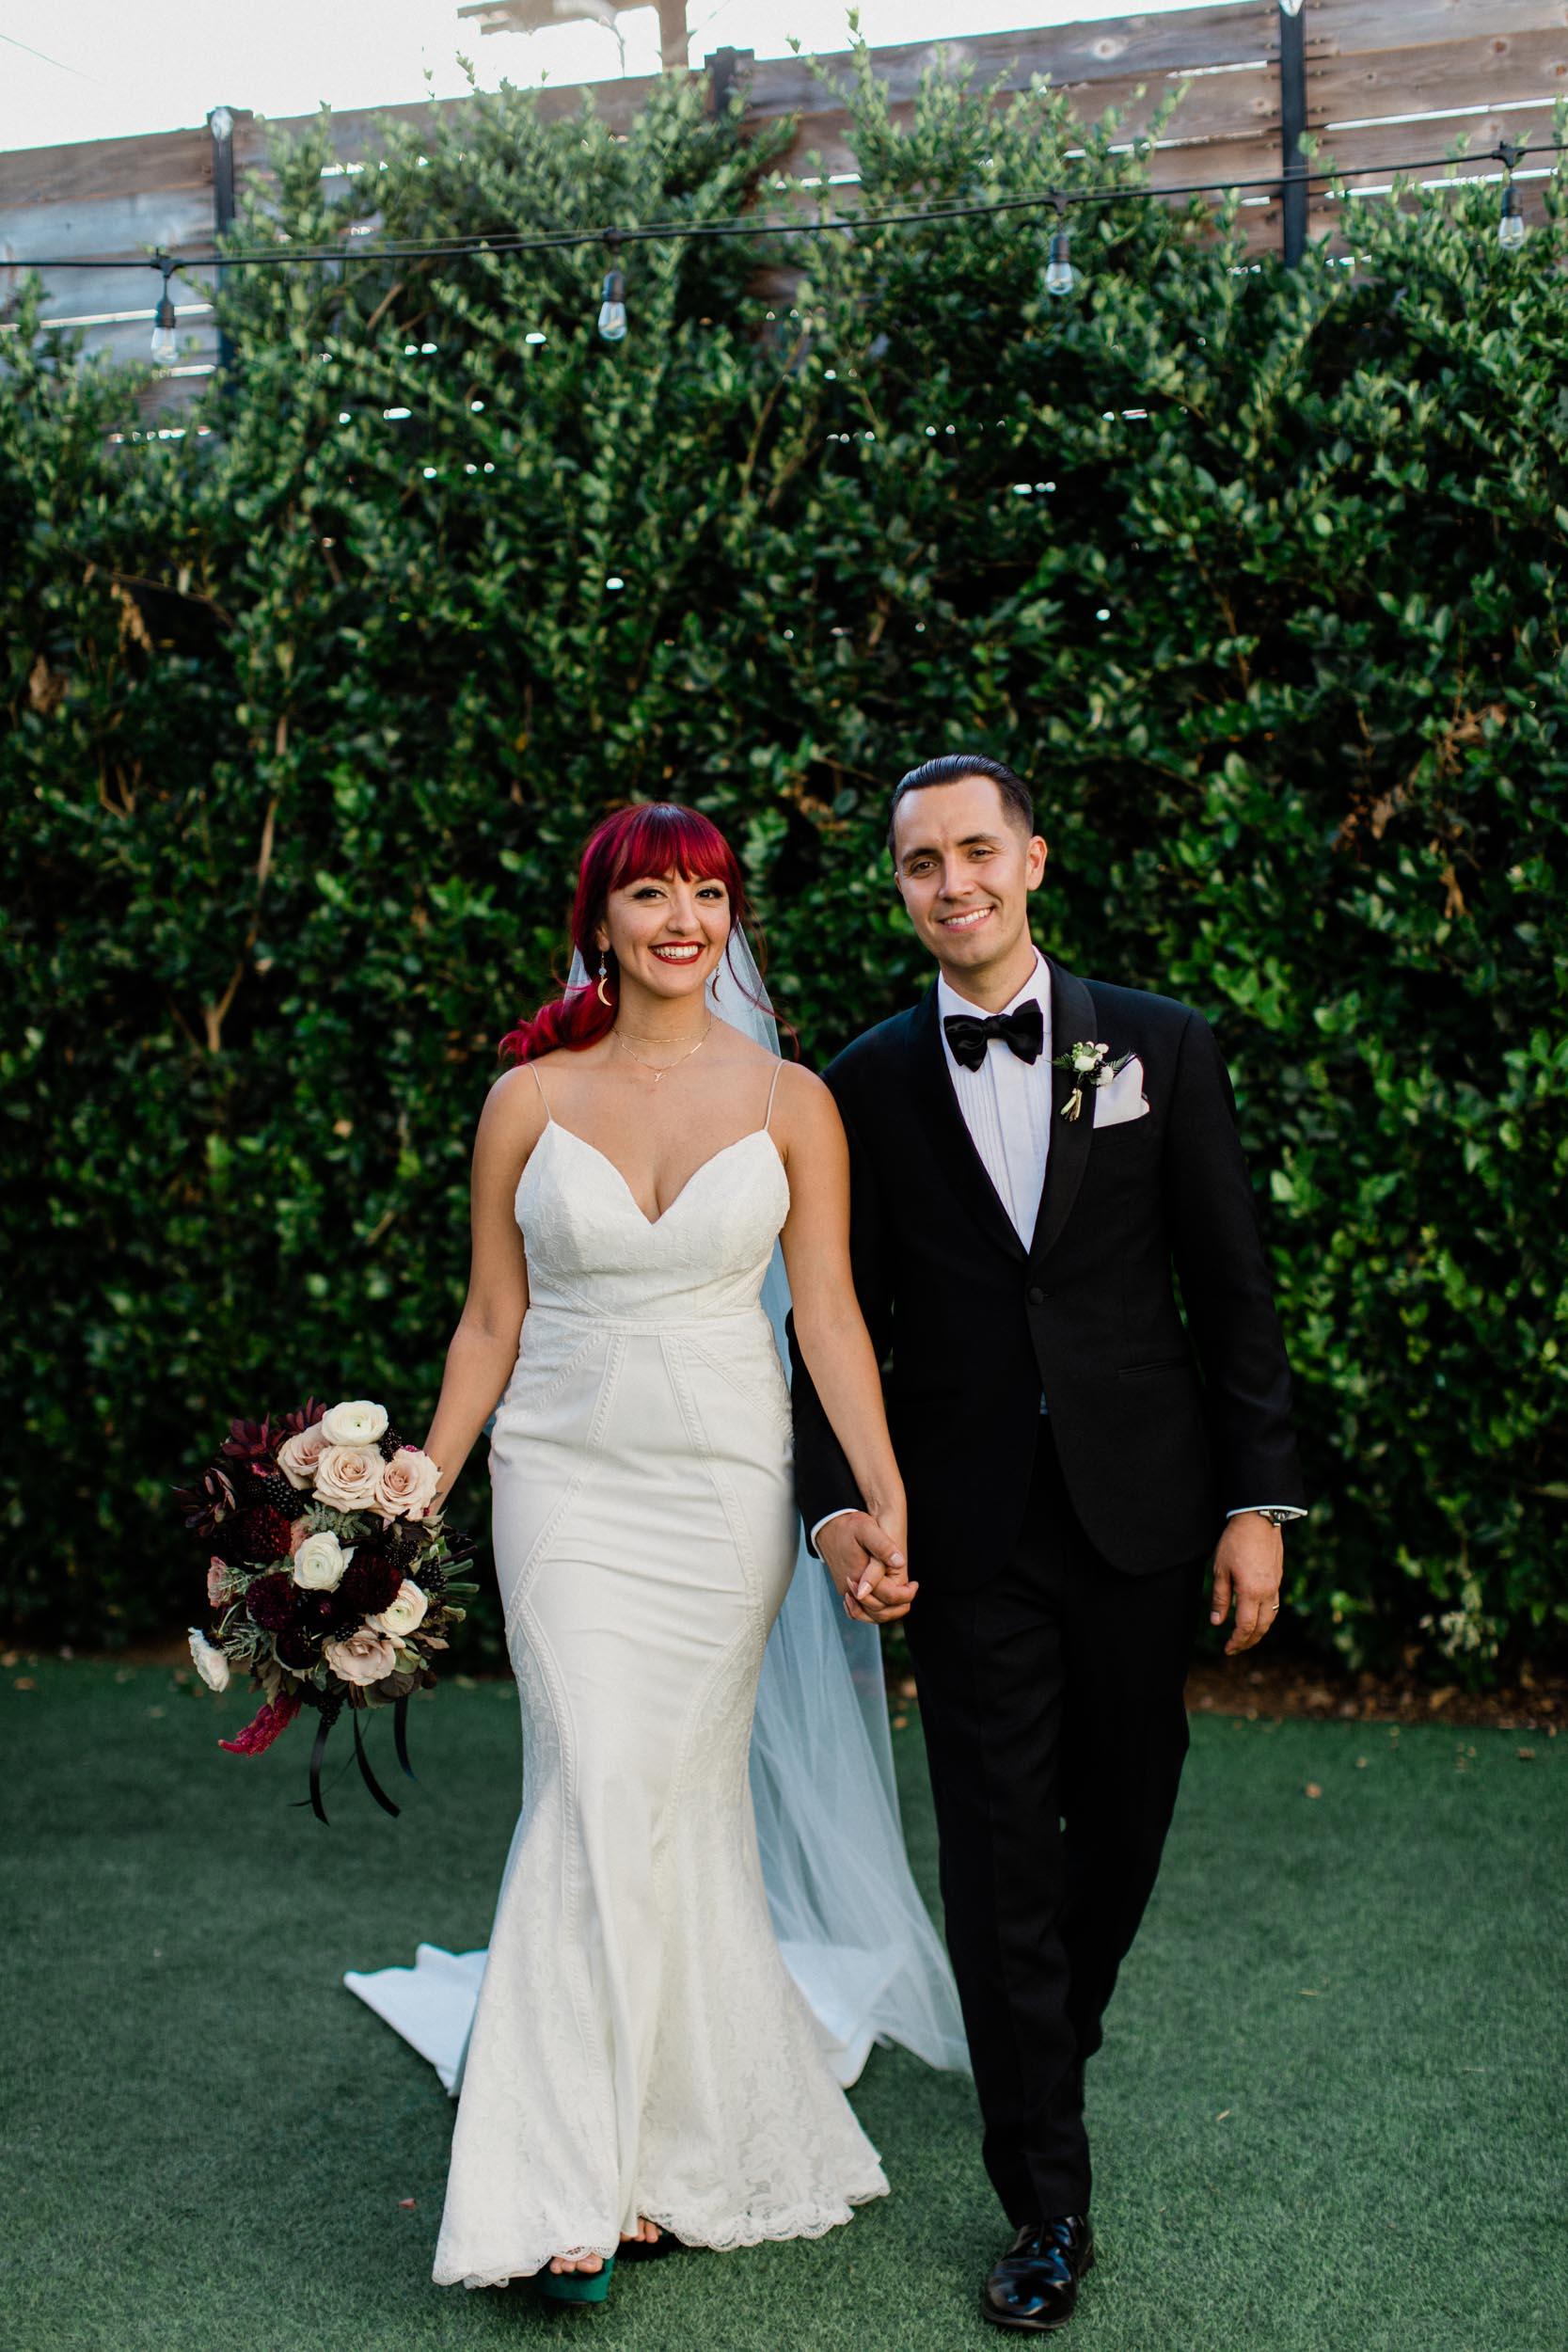 BKM-Photography-Los-Angeles-Highland-Park-York-Manor-Wedding-Photography-0806.jpg